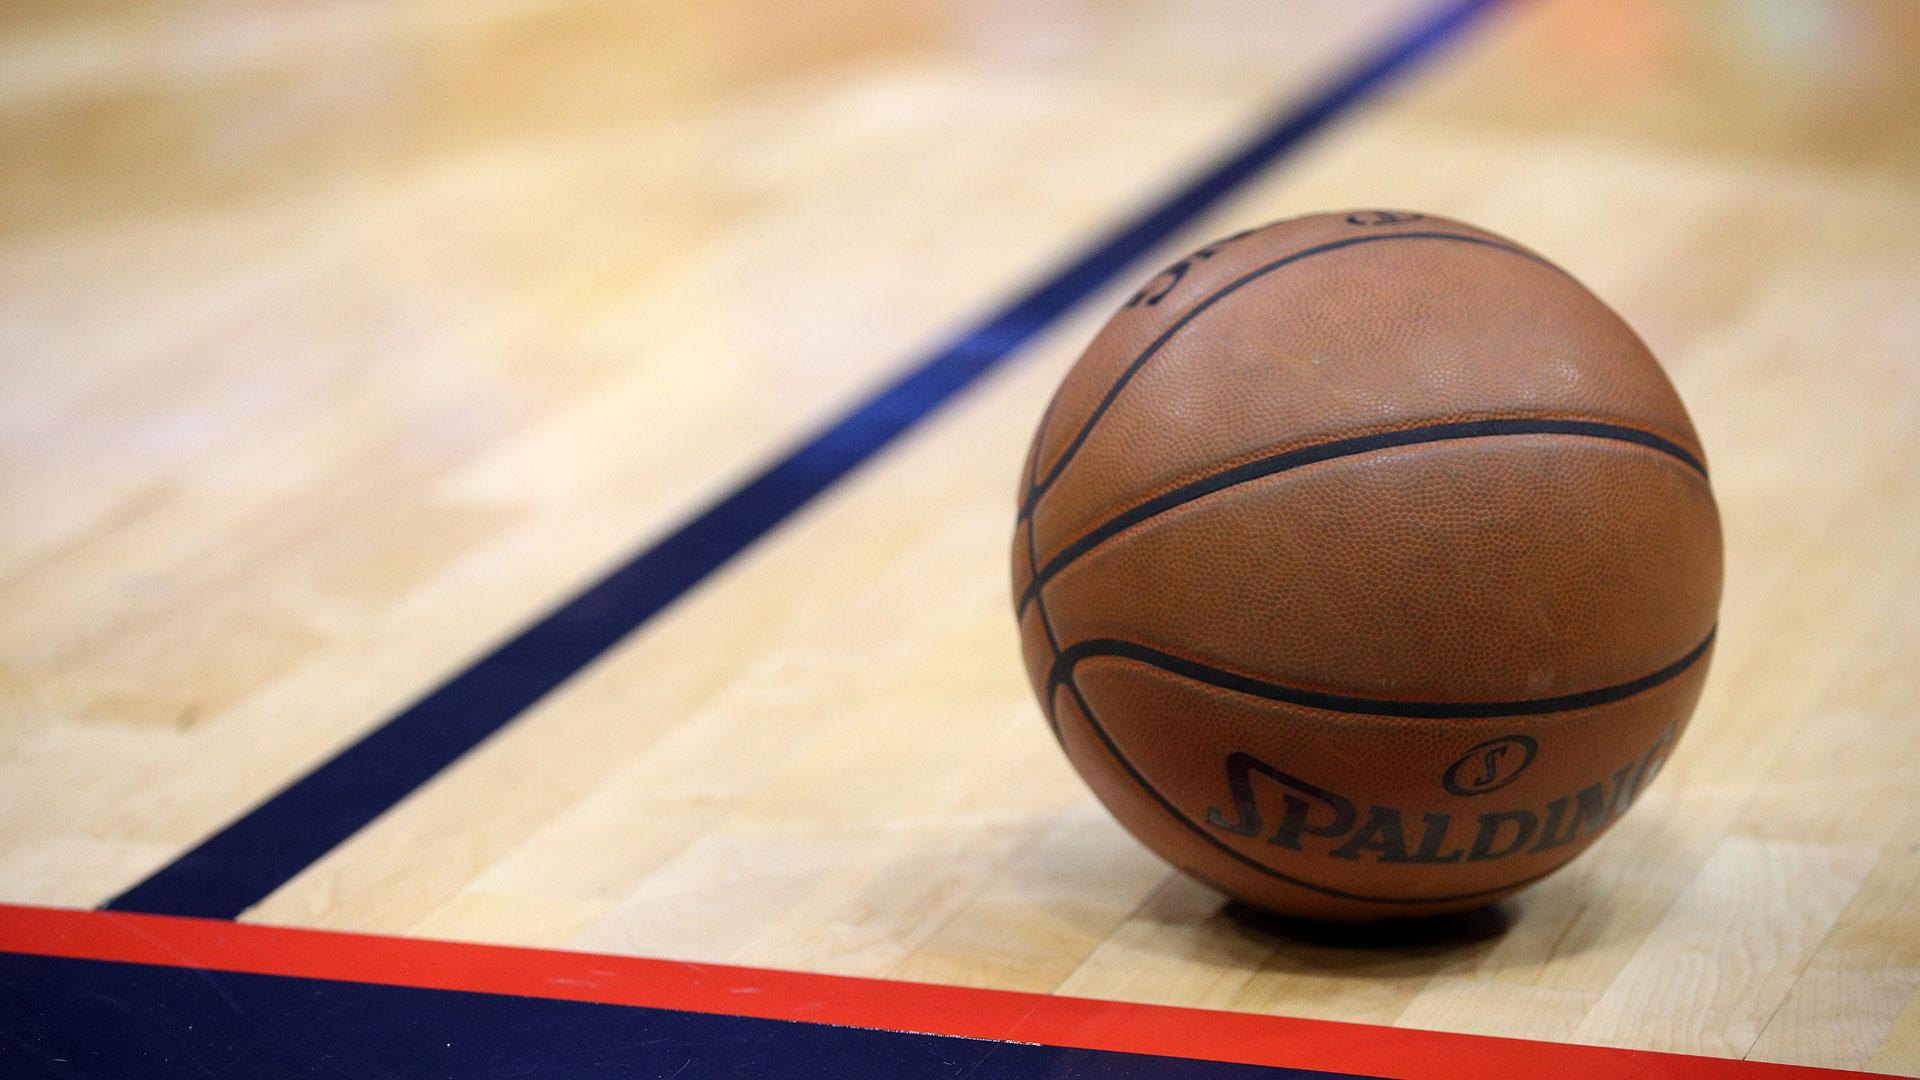 NBA Spalding basketball